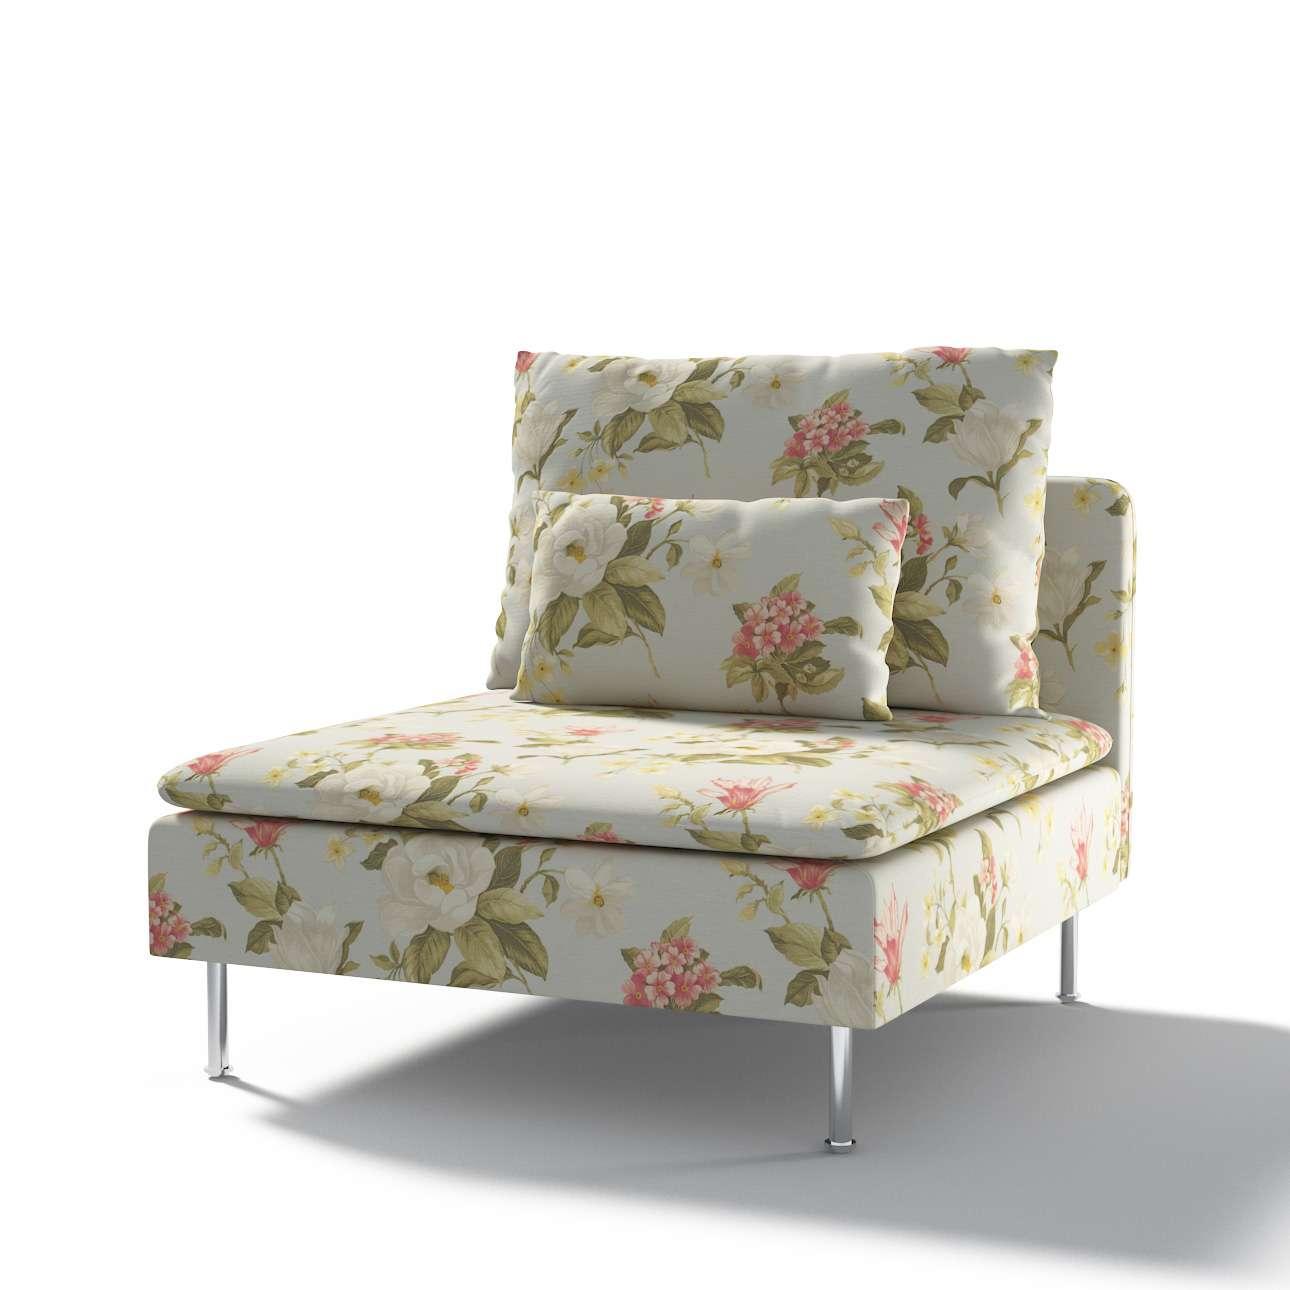 s derhamn bezug f r sitzelement 1 helllblau dekoria. Black Bedroom Furniture Sets. Home Design Ideas